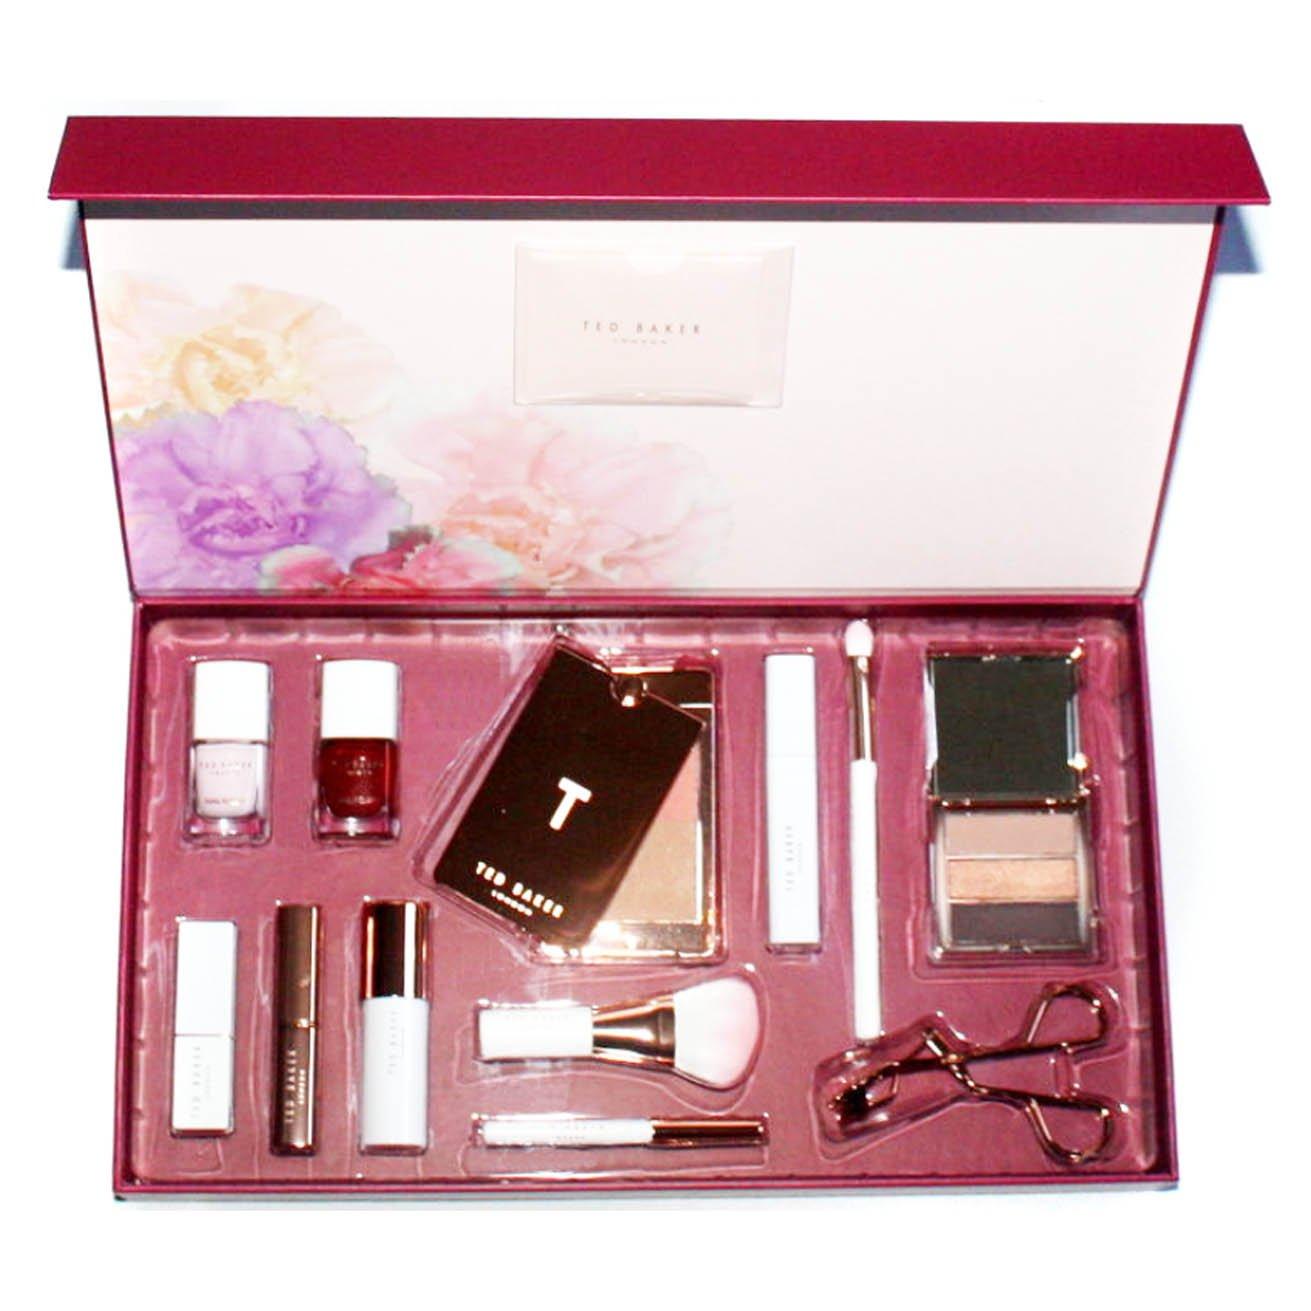 b85acf2416fe0  NEW  Ted Baker Treasure Trove Large Make Up Gift Set  Amazon.co.uk  Beauty